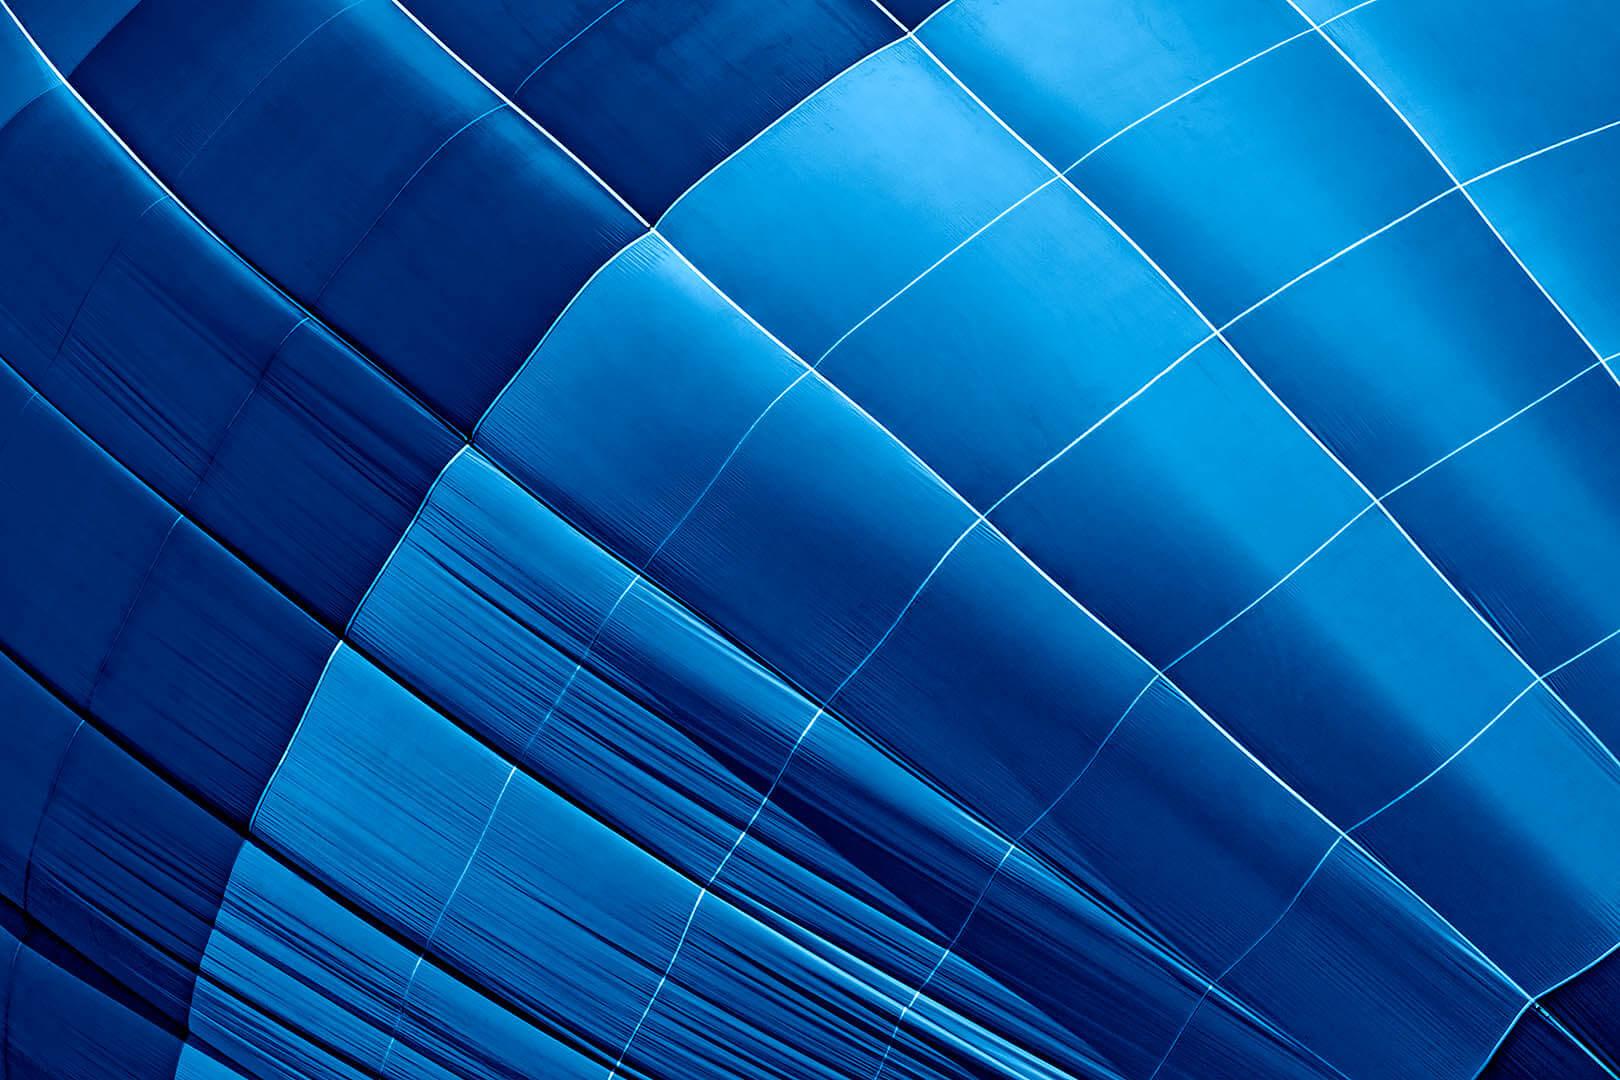 Blue Hot Air Balloon Abstract